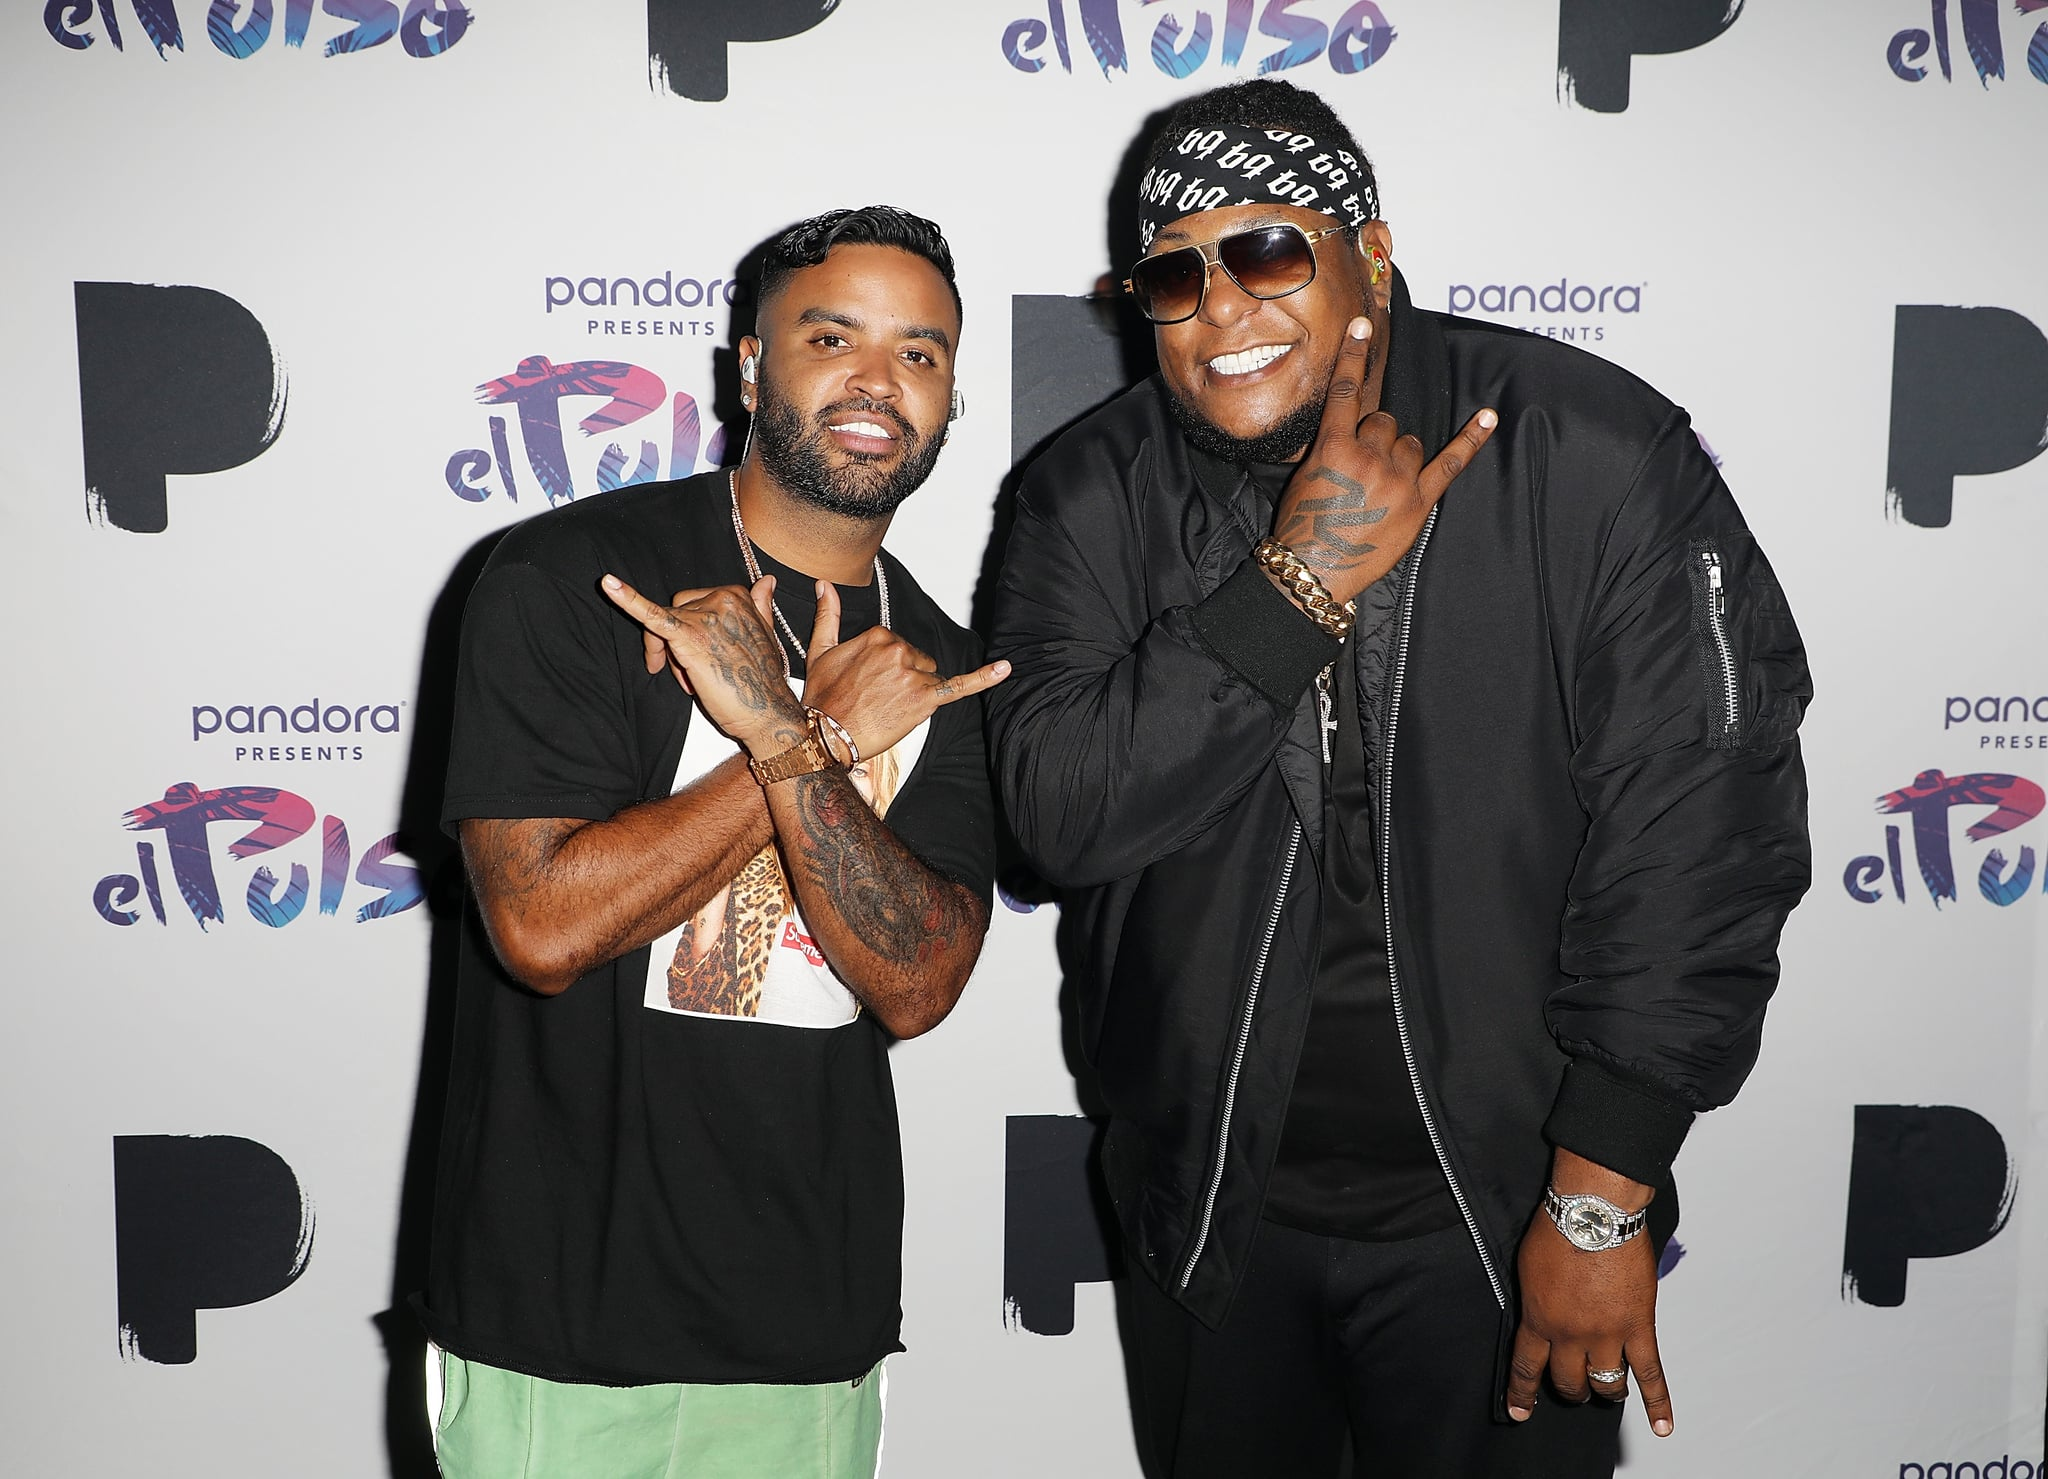 MIAMI, FL - JUNE 19:  Zion Y Lennox attend Pandora Presents El Pulso on June 19, 2018 in Miami City.  (Photo by Alexander Tamargo/Getty Images for Pandora Media)